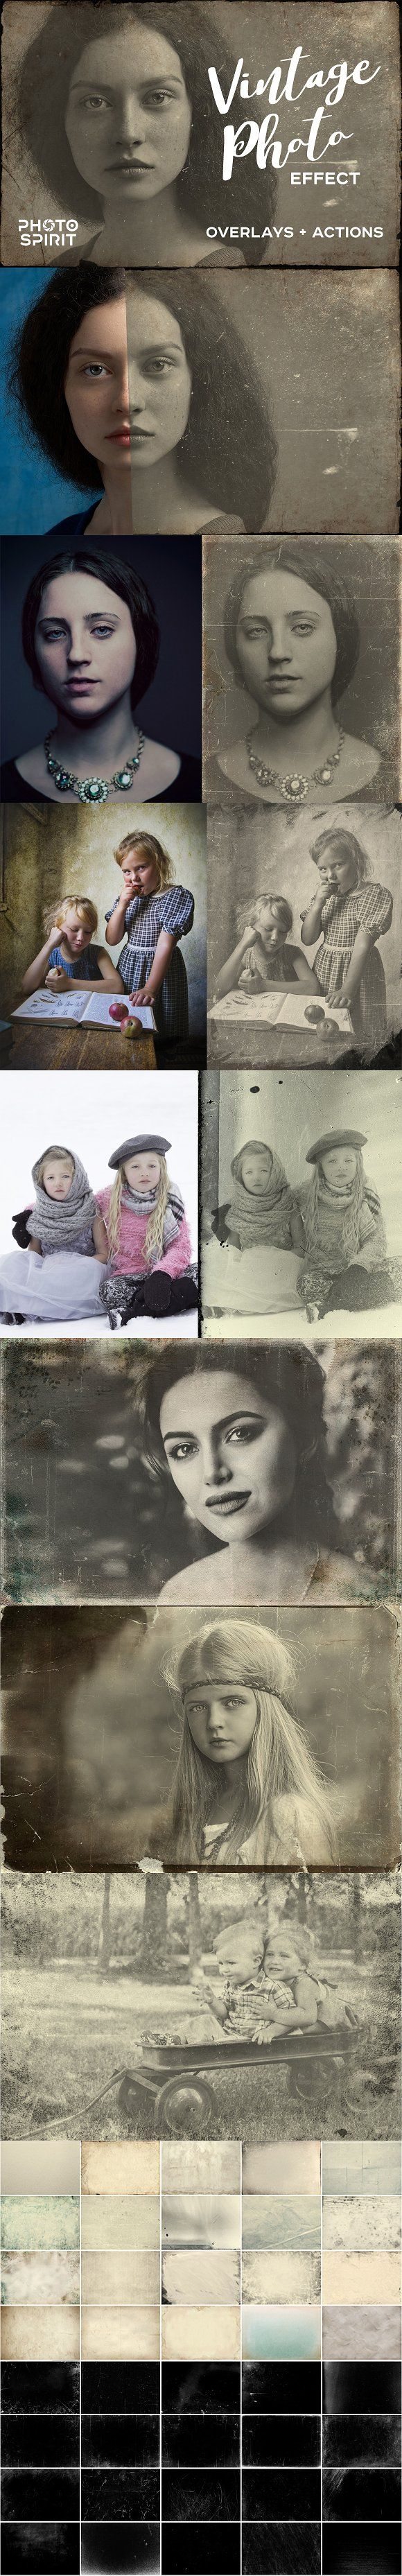 Vintage Old Photo Effect Overlays by PhotoSpirit on @creativemarket